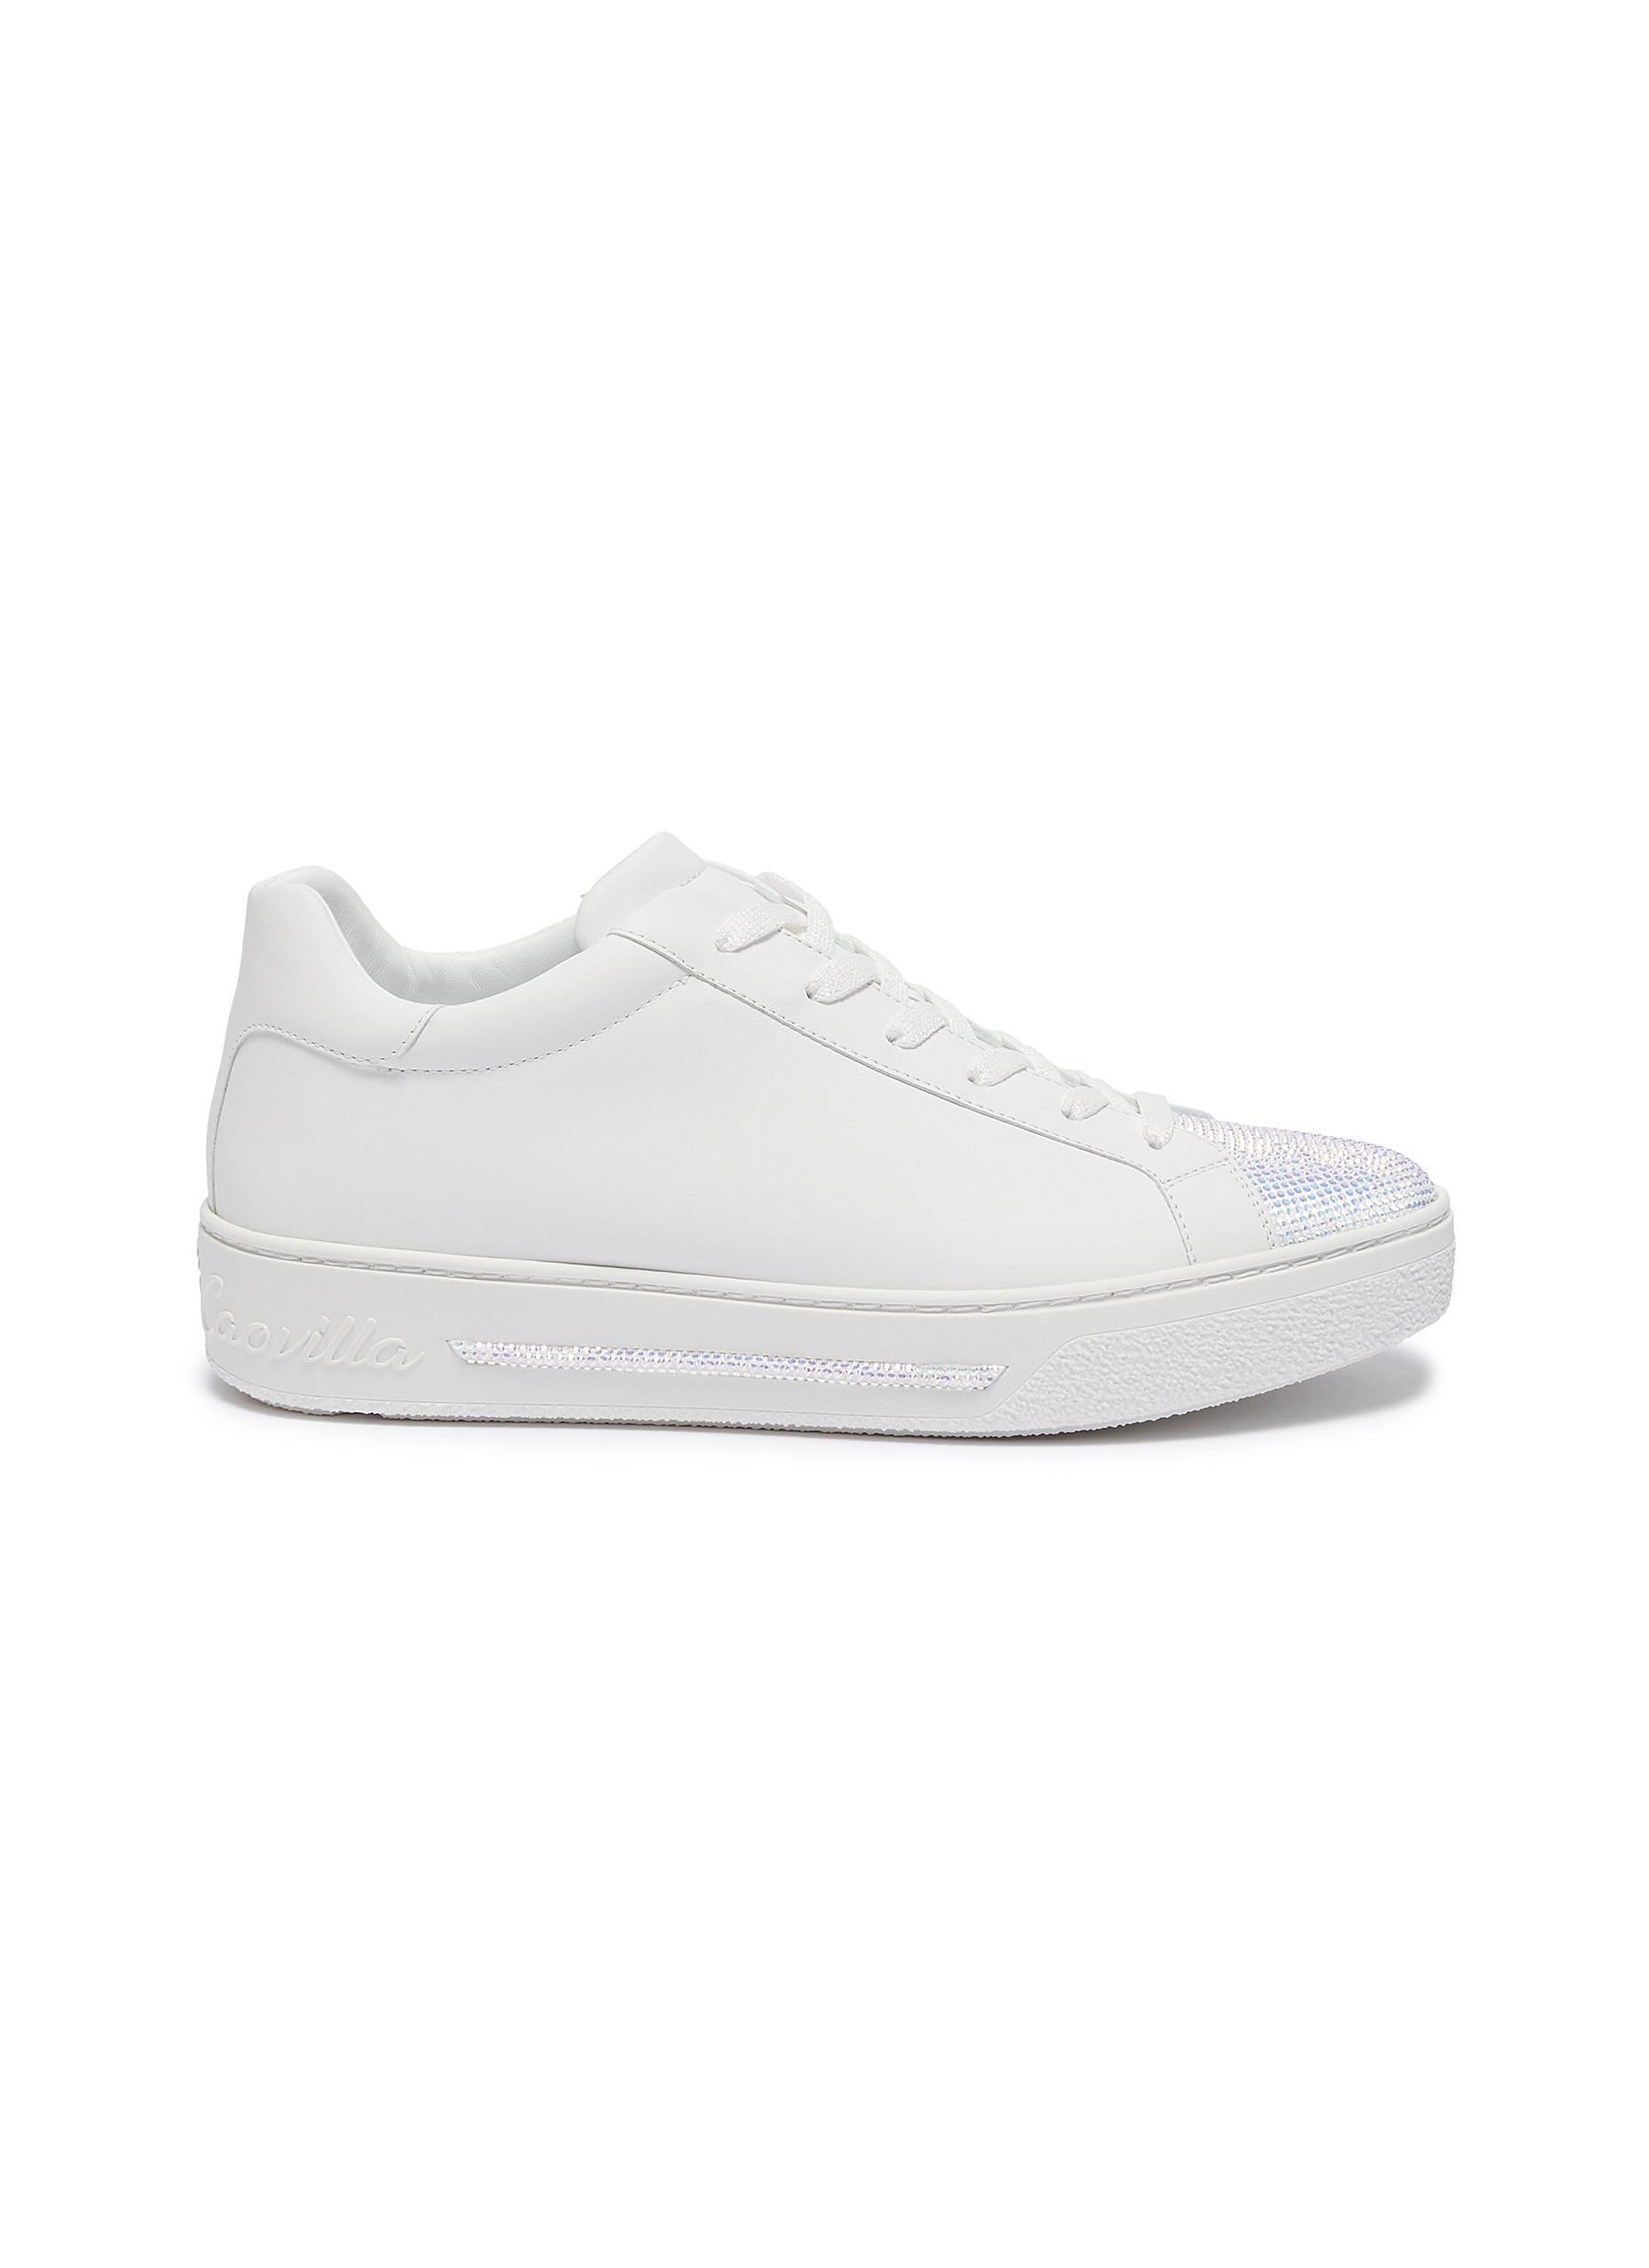 René Caovilla Sneakers Strass embellished lambskin leather sneakers